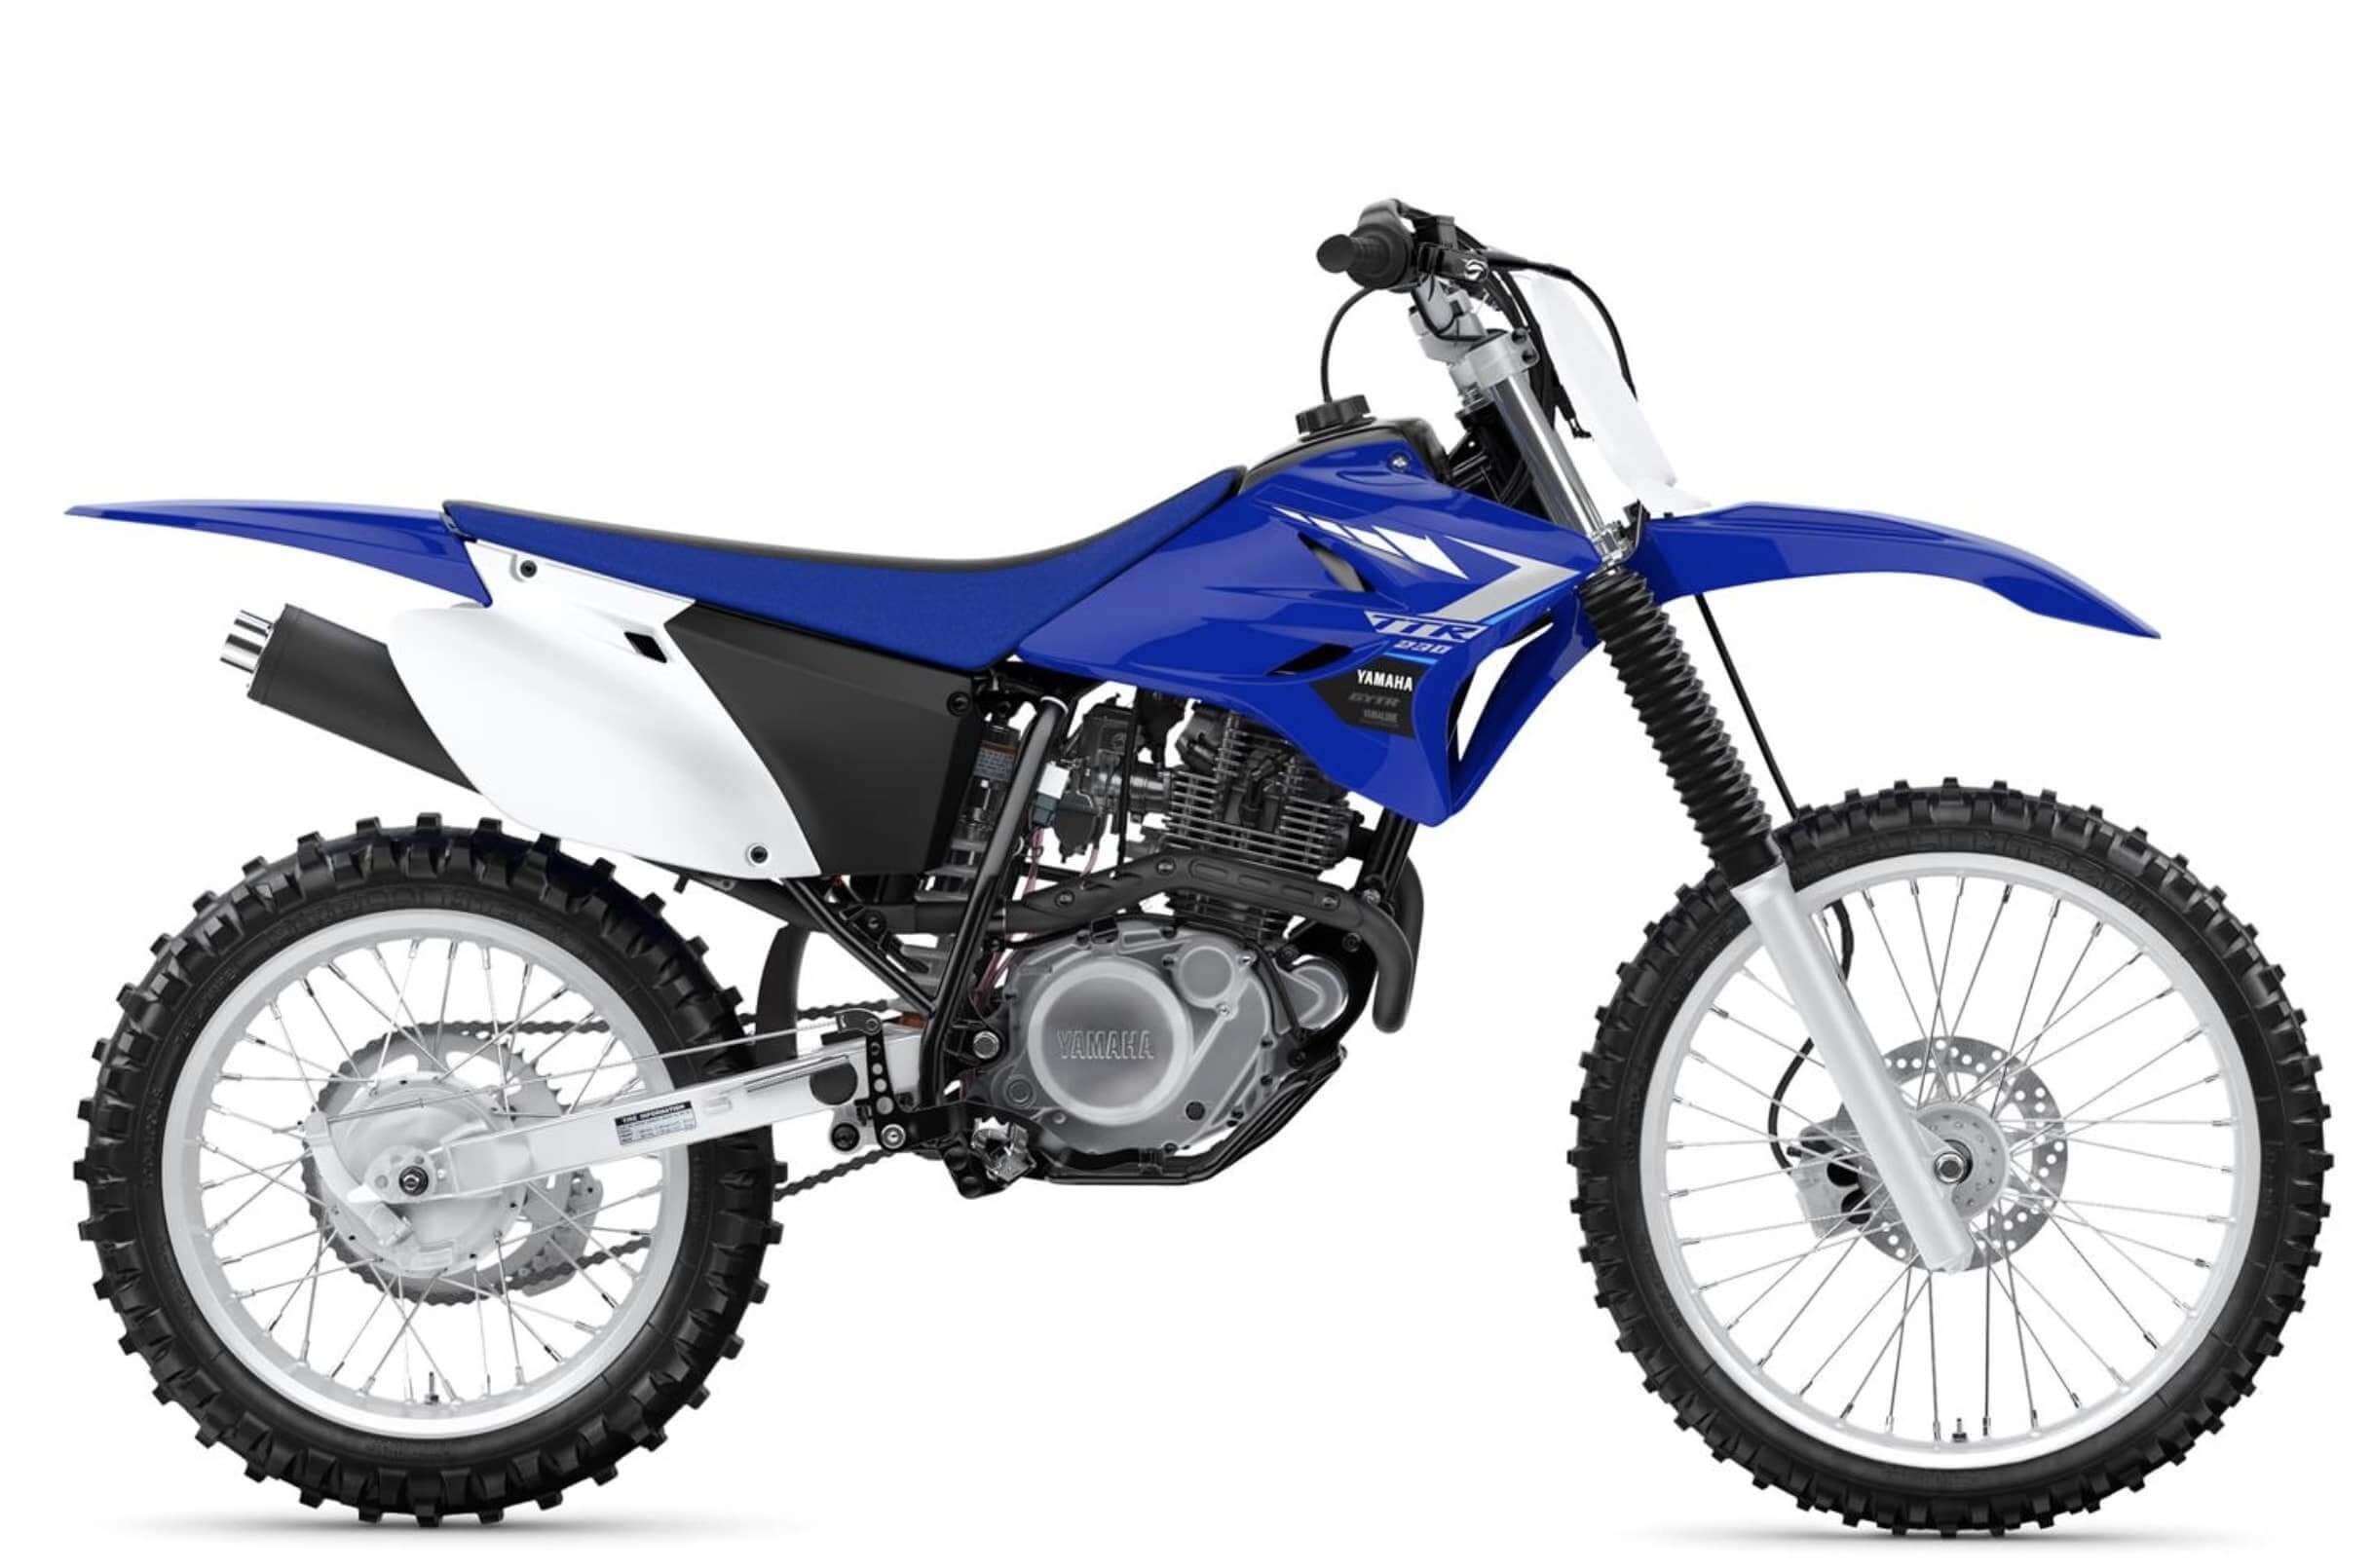 2020 Yamaha TT-R 230